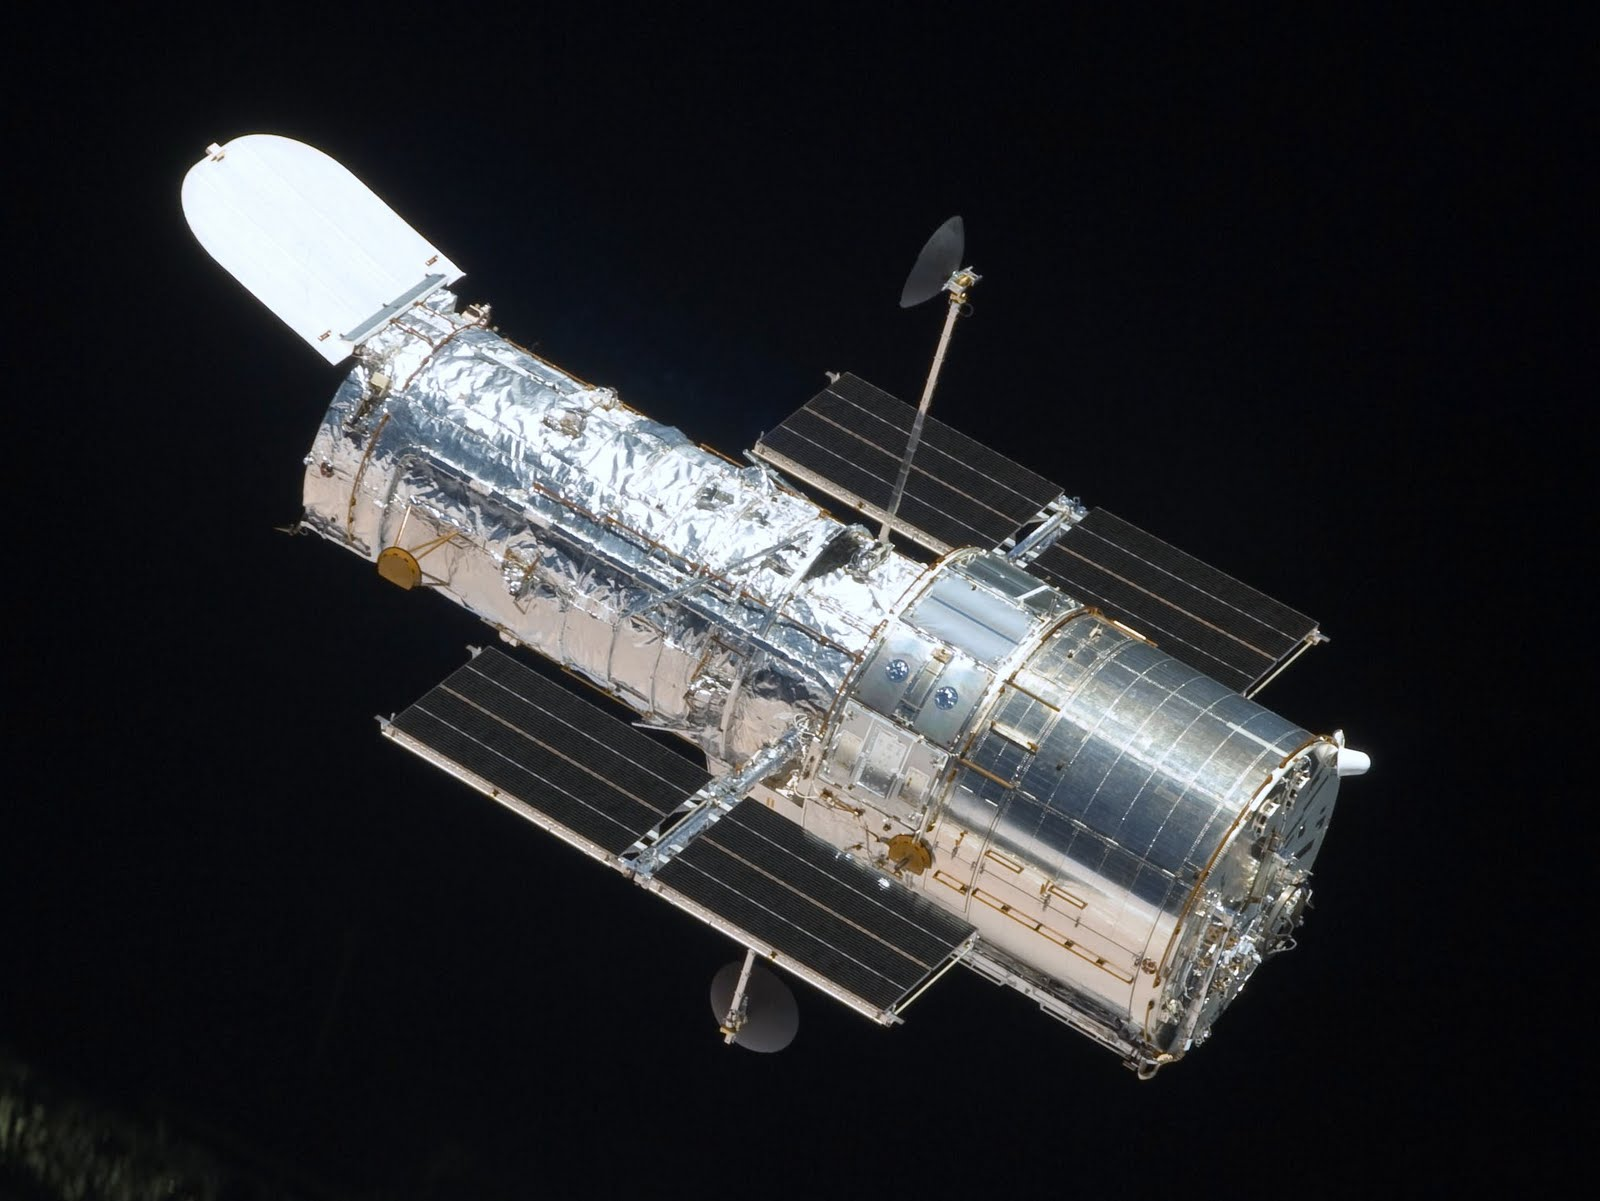 KryptonZone Blog: Hubble Space Telescope @ 20 Years